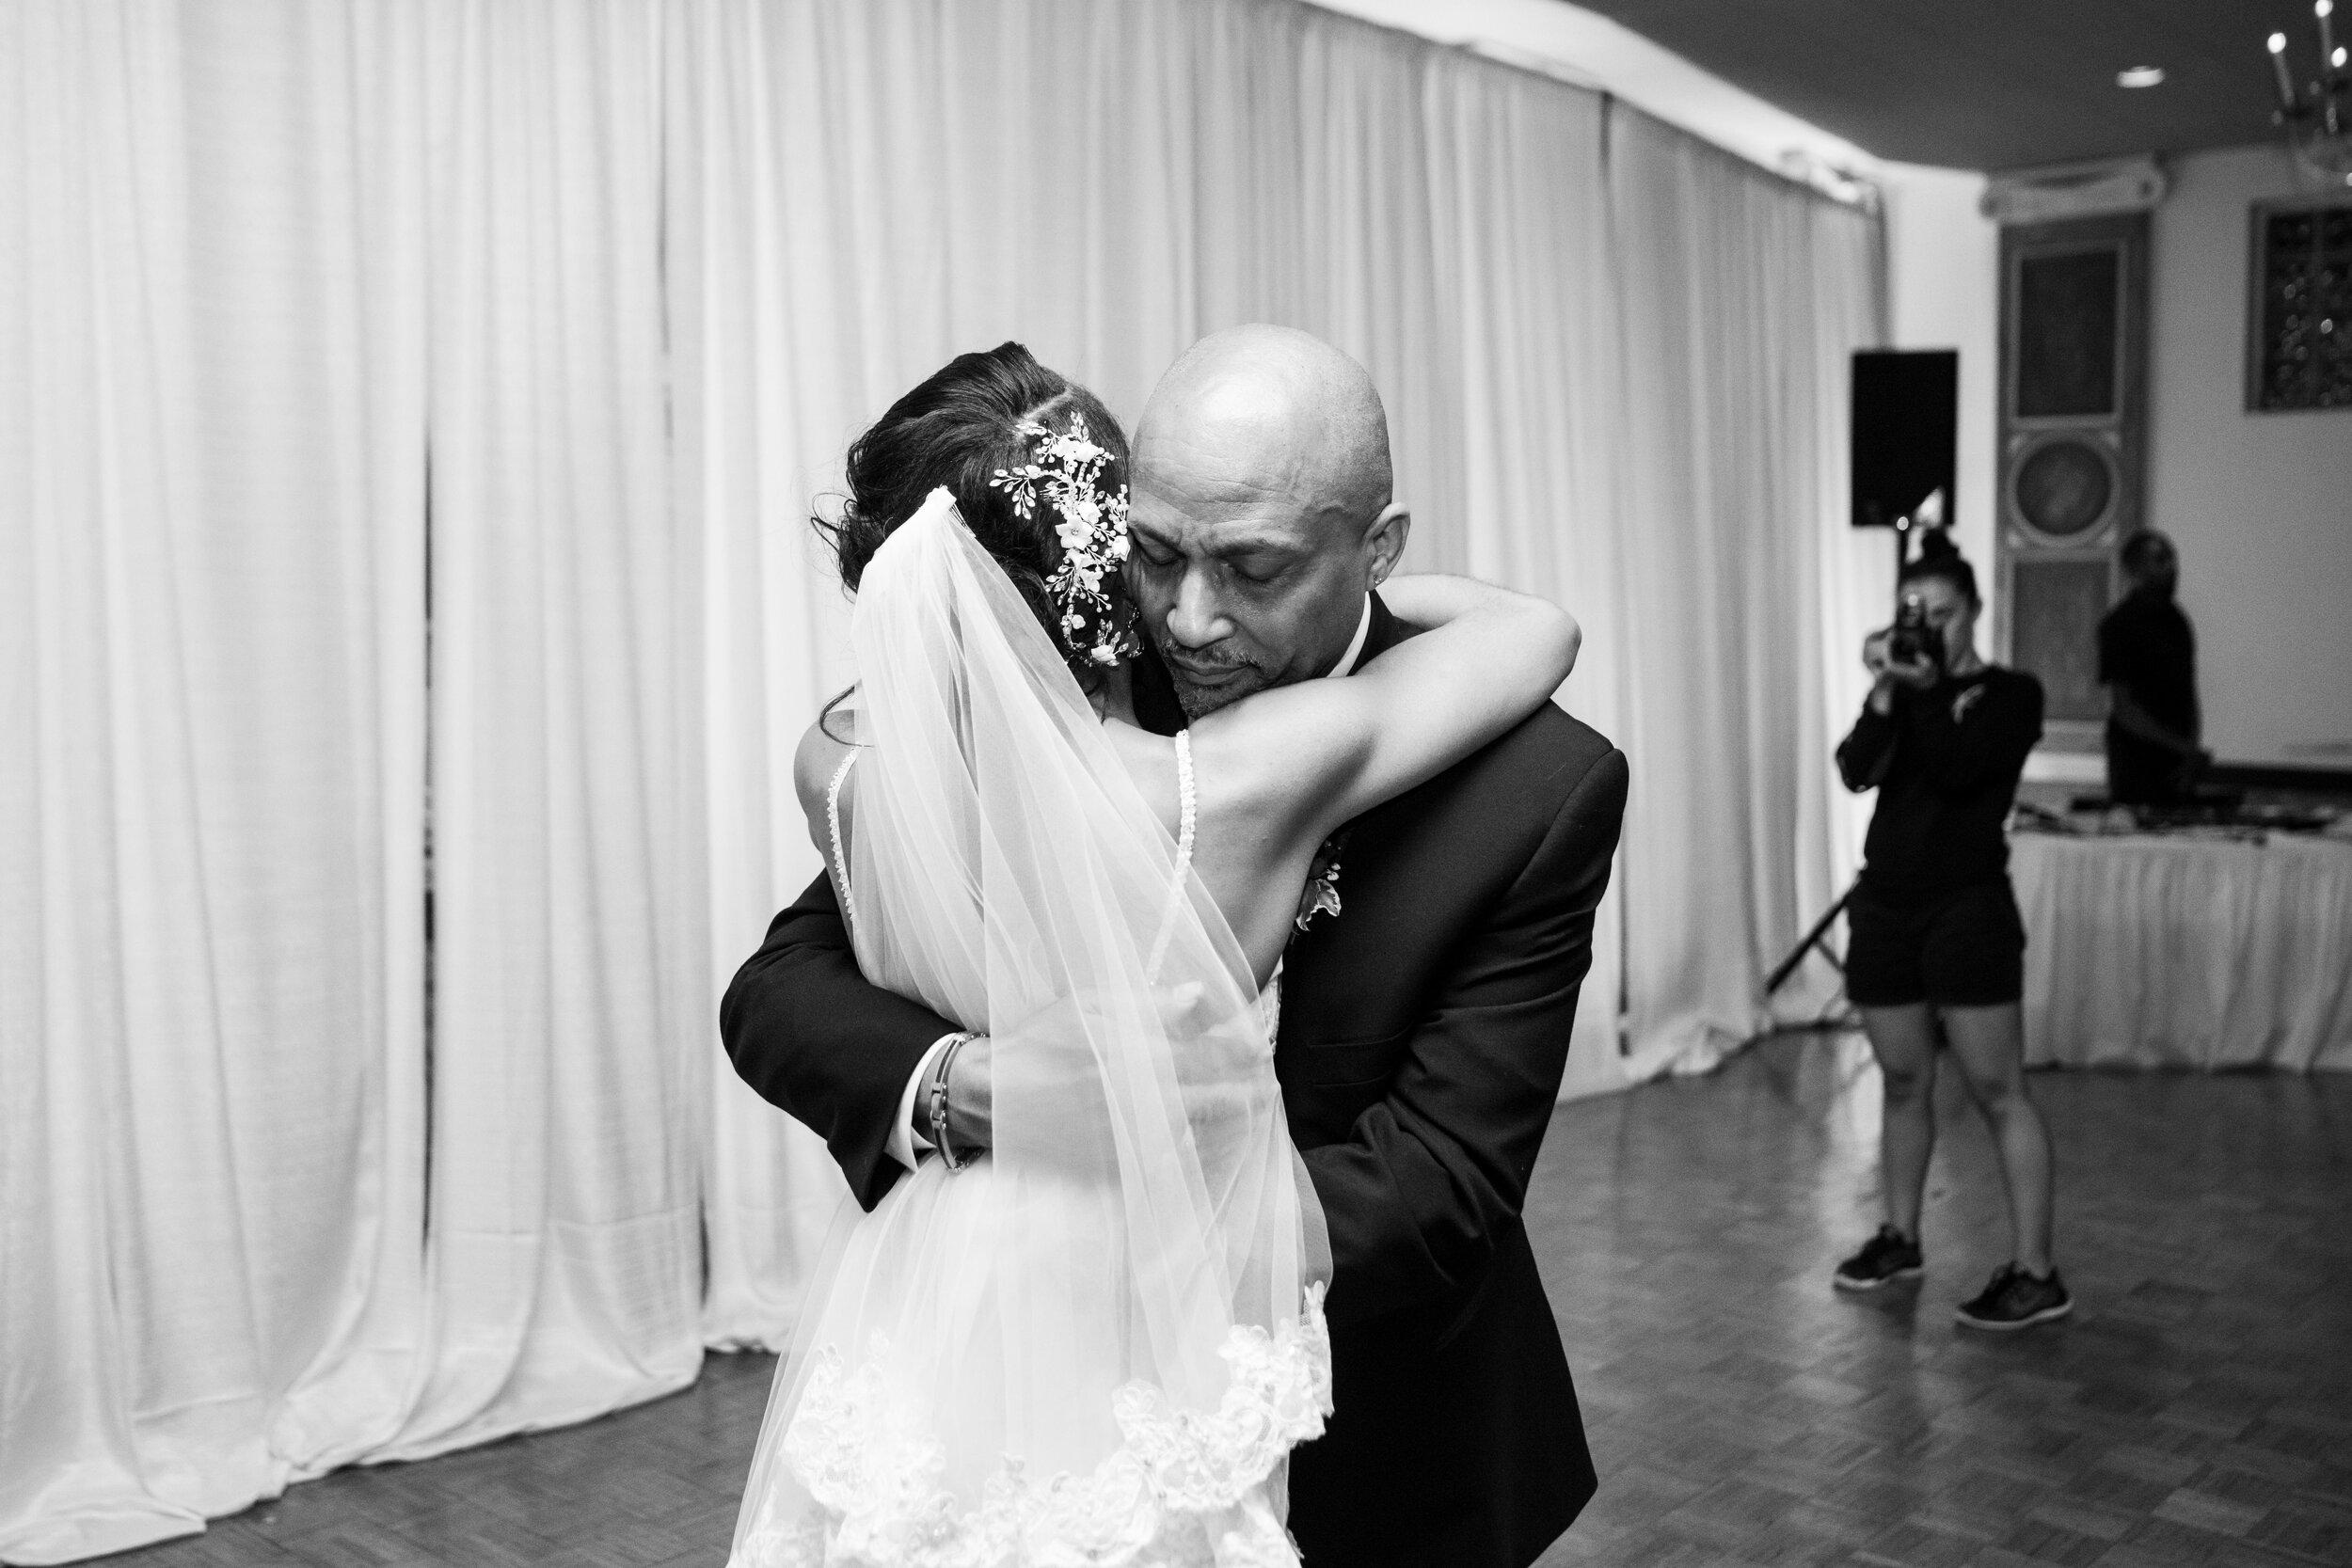 8_3_2019_BONTY_WEDDING-822.jpg